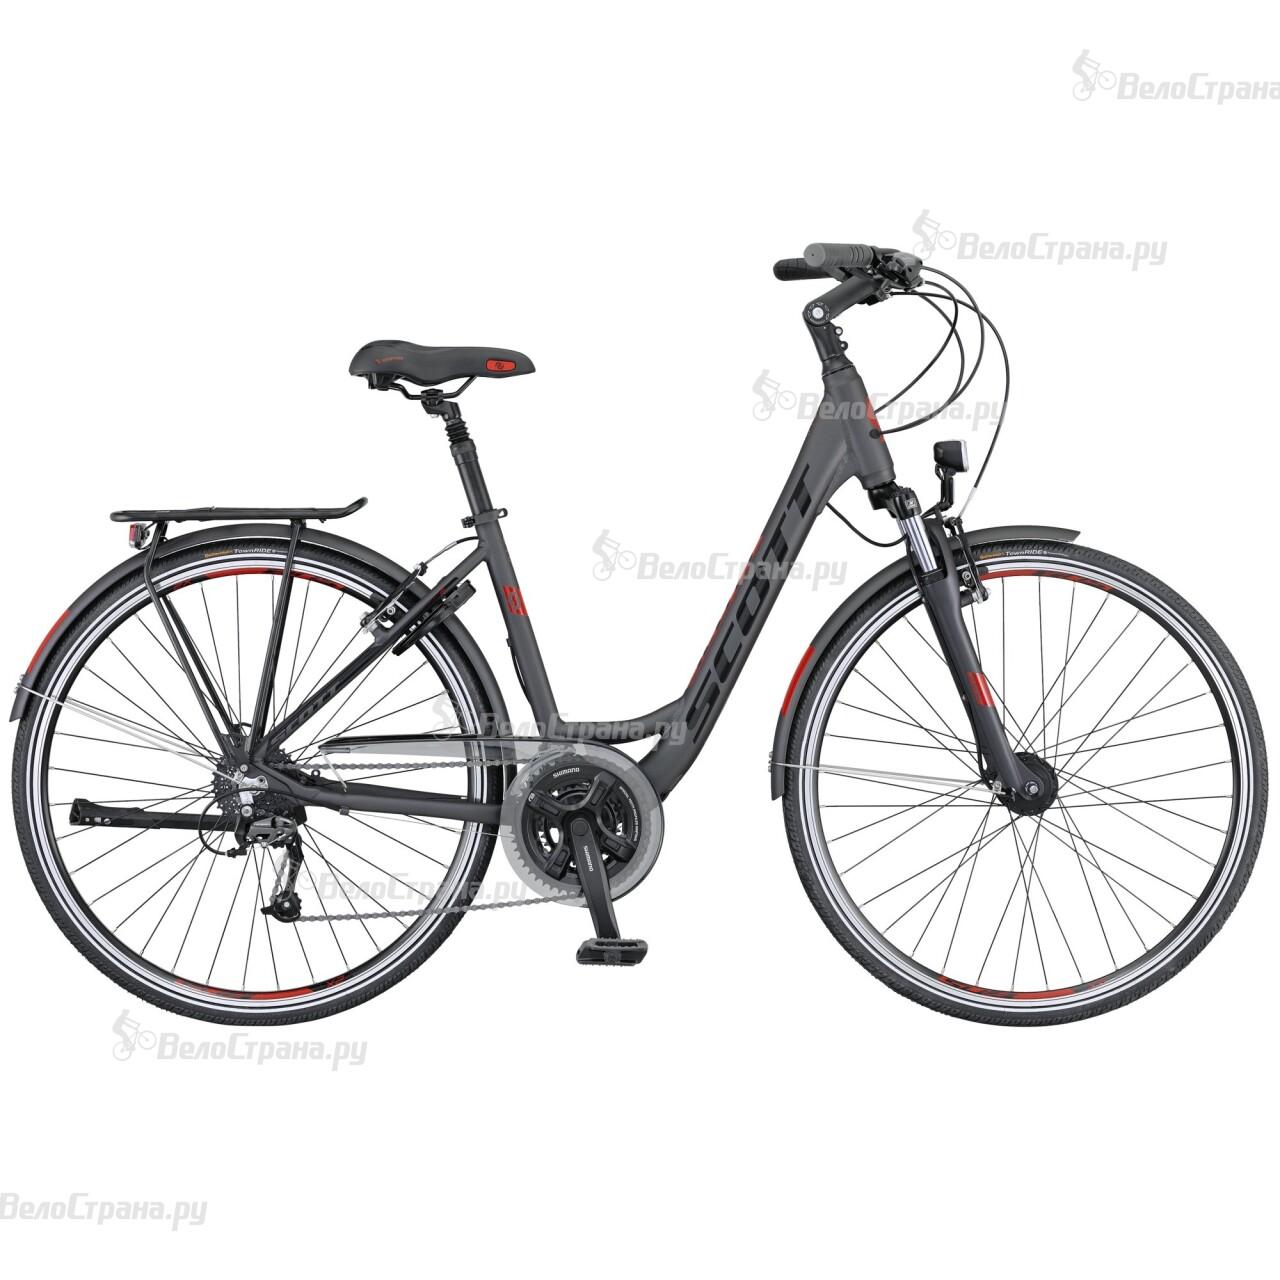 Велосипед Scott Sub Comfort 10 Unisex (2016) definitive technology iw sub 10 10